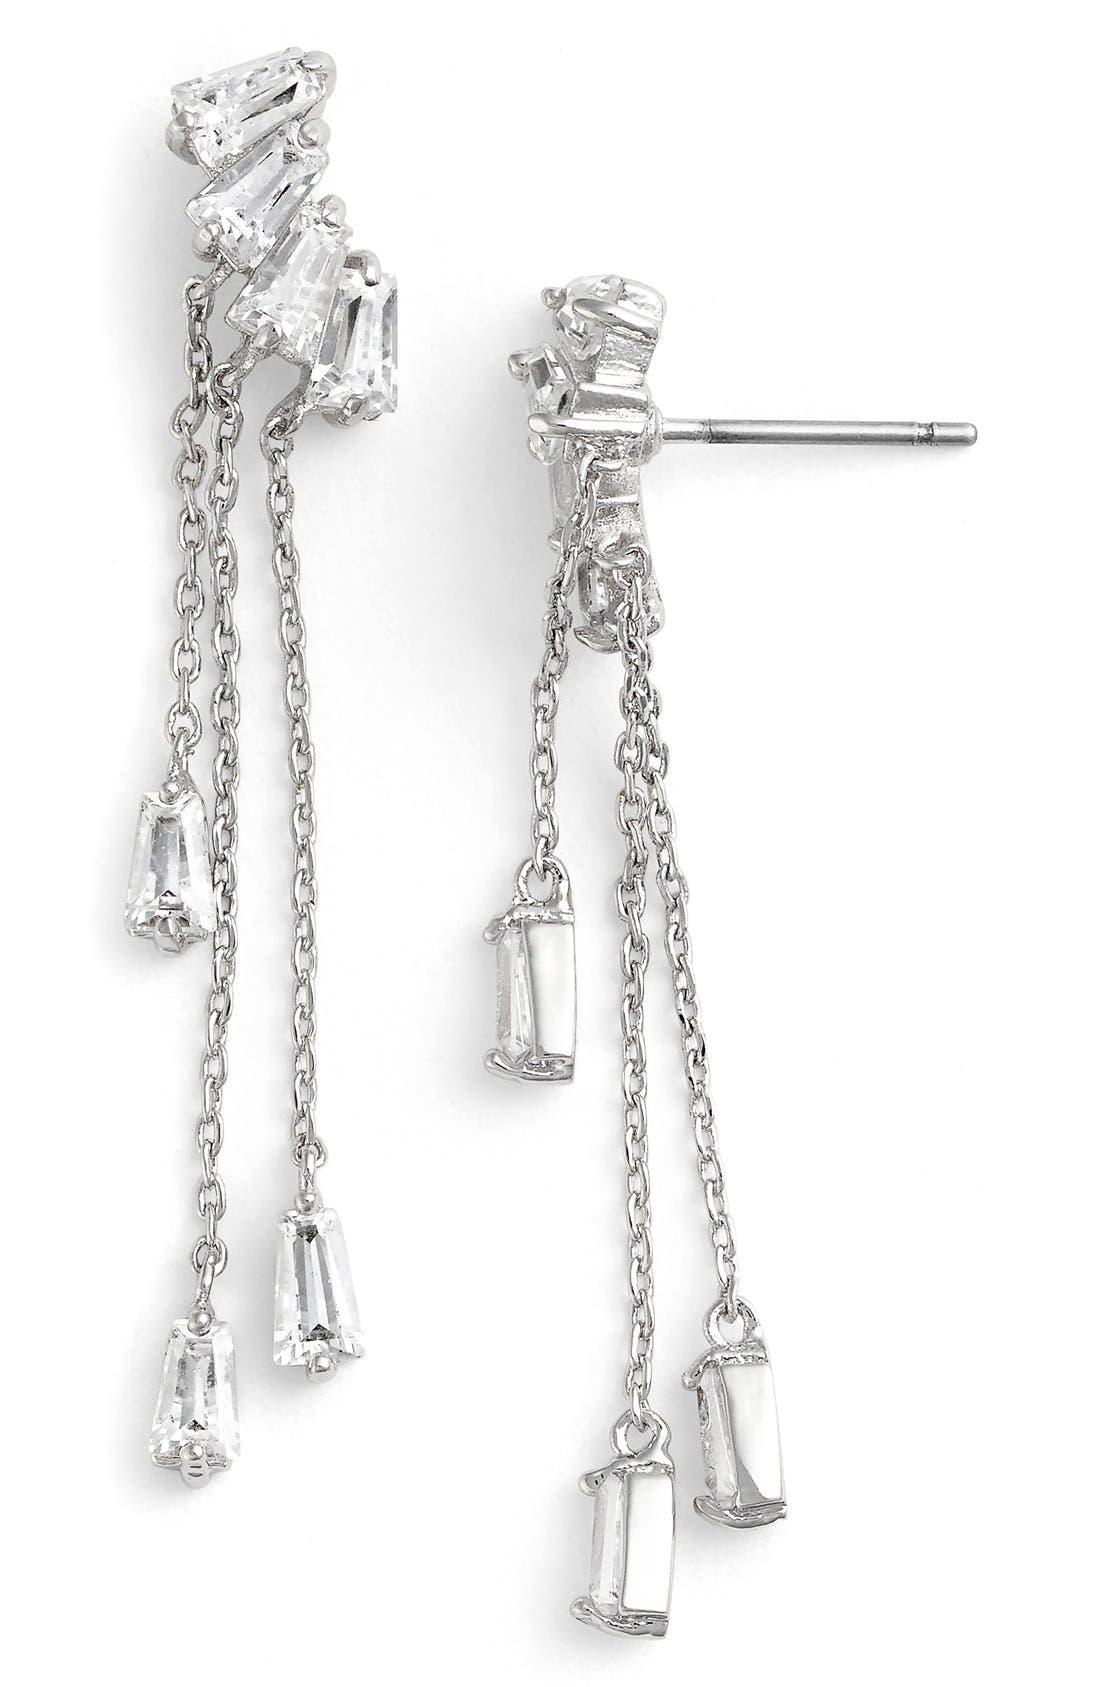 Baguette Fringe Cubic Zirconia Drop Earrings,                             Main thumbnail 1, color,                             040